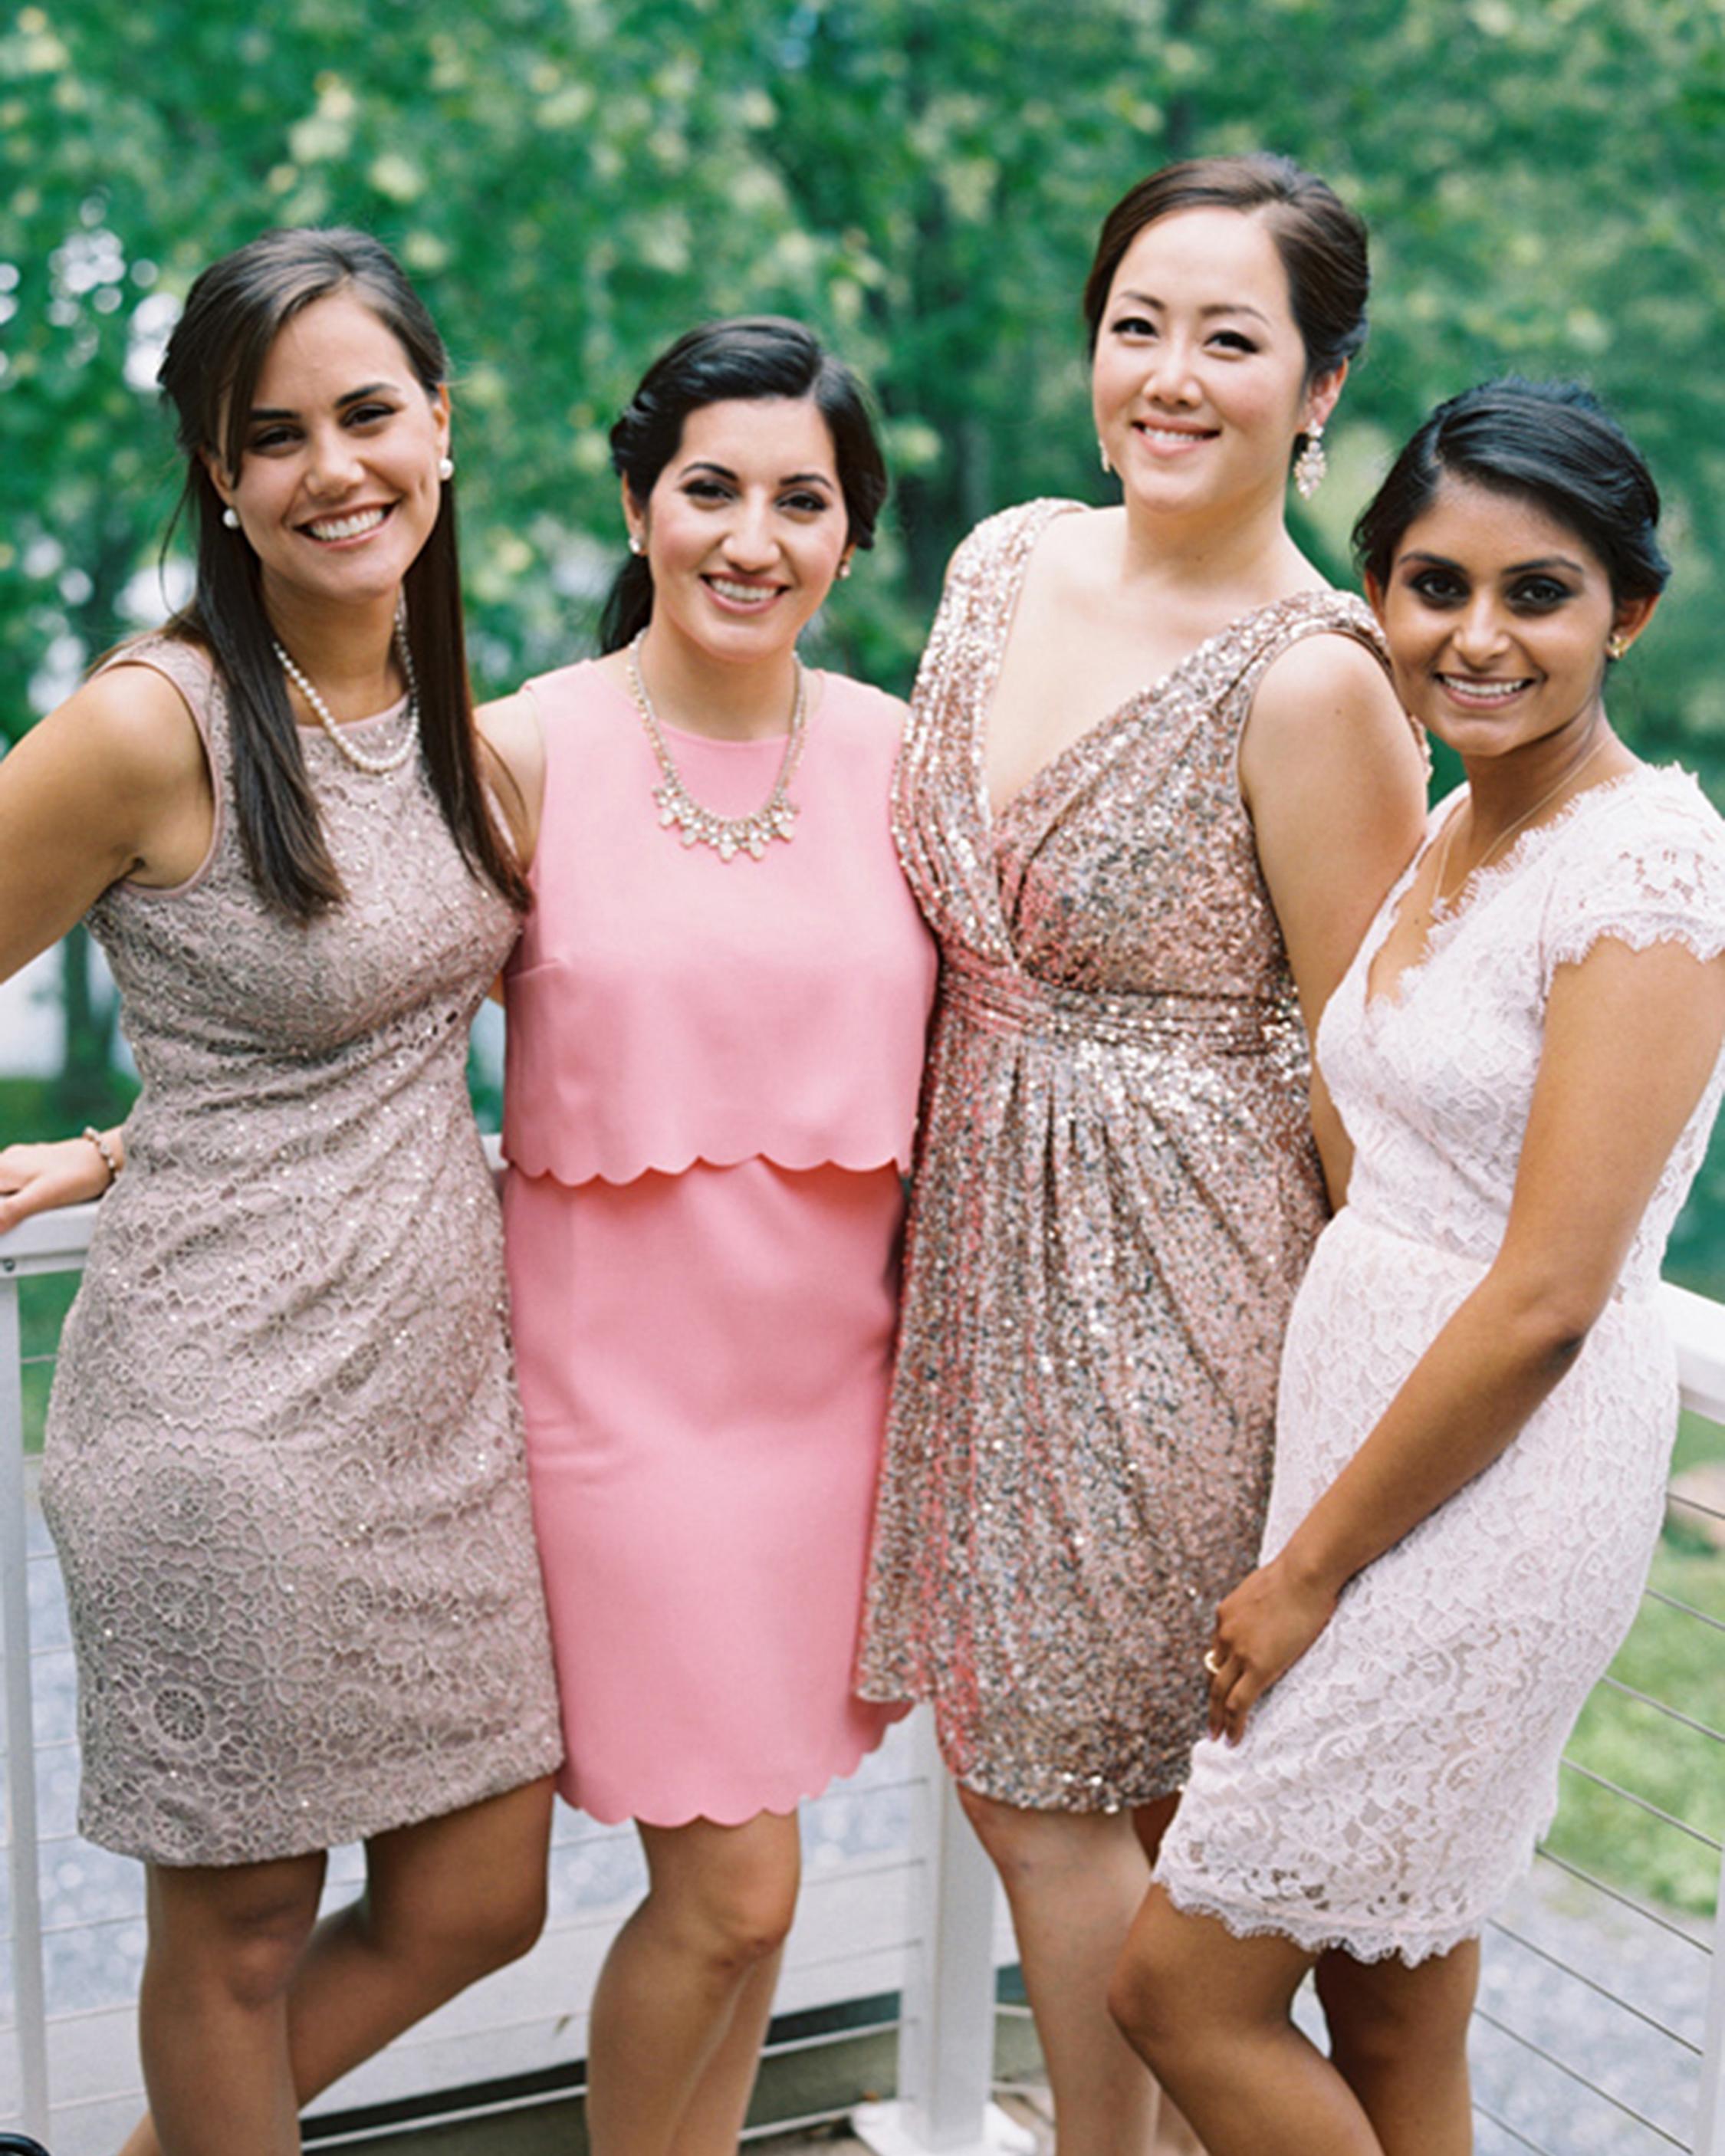 summer wedding guests color coordinated